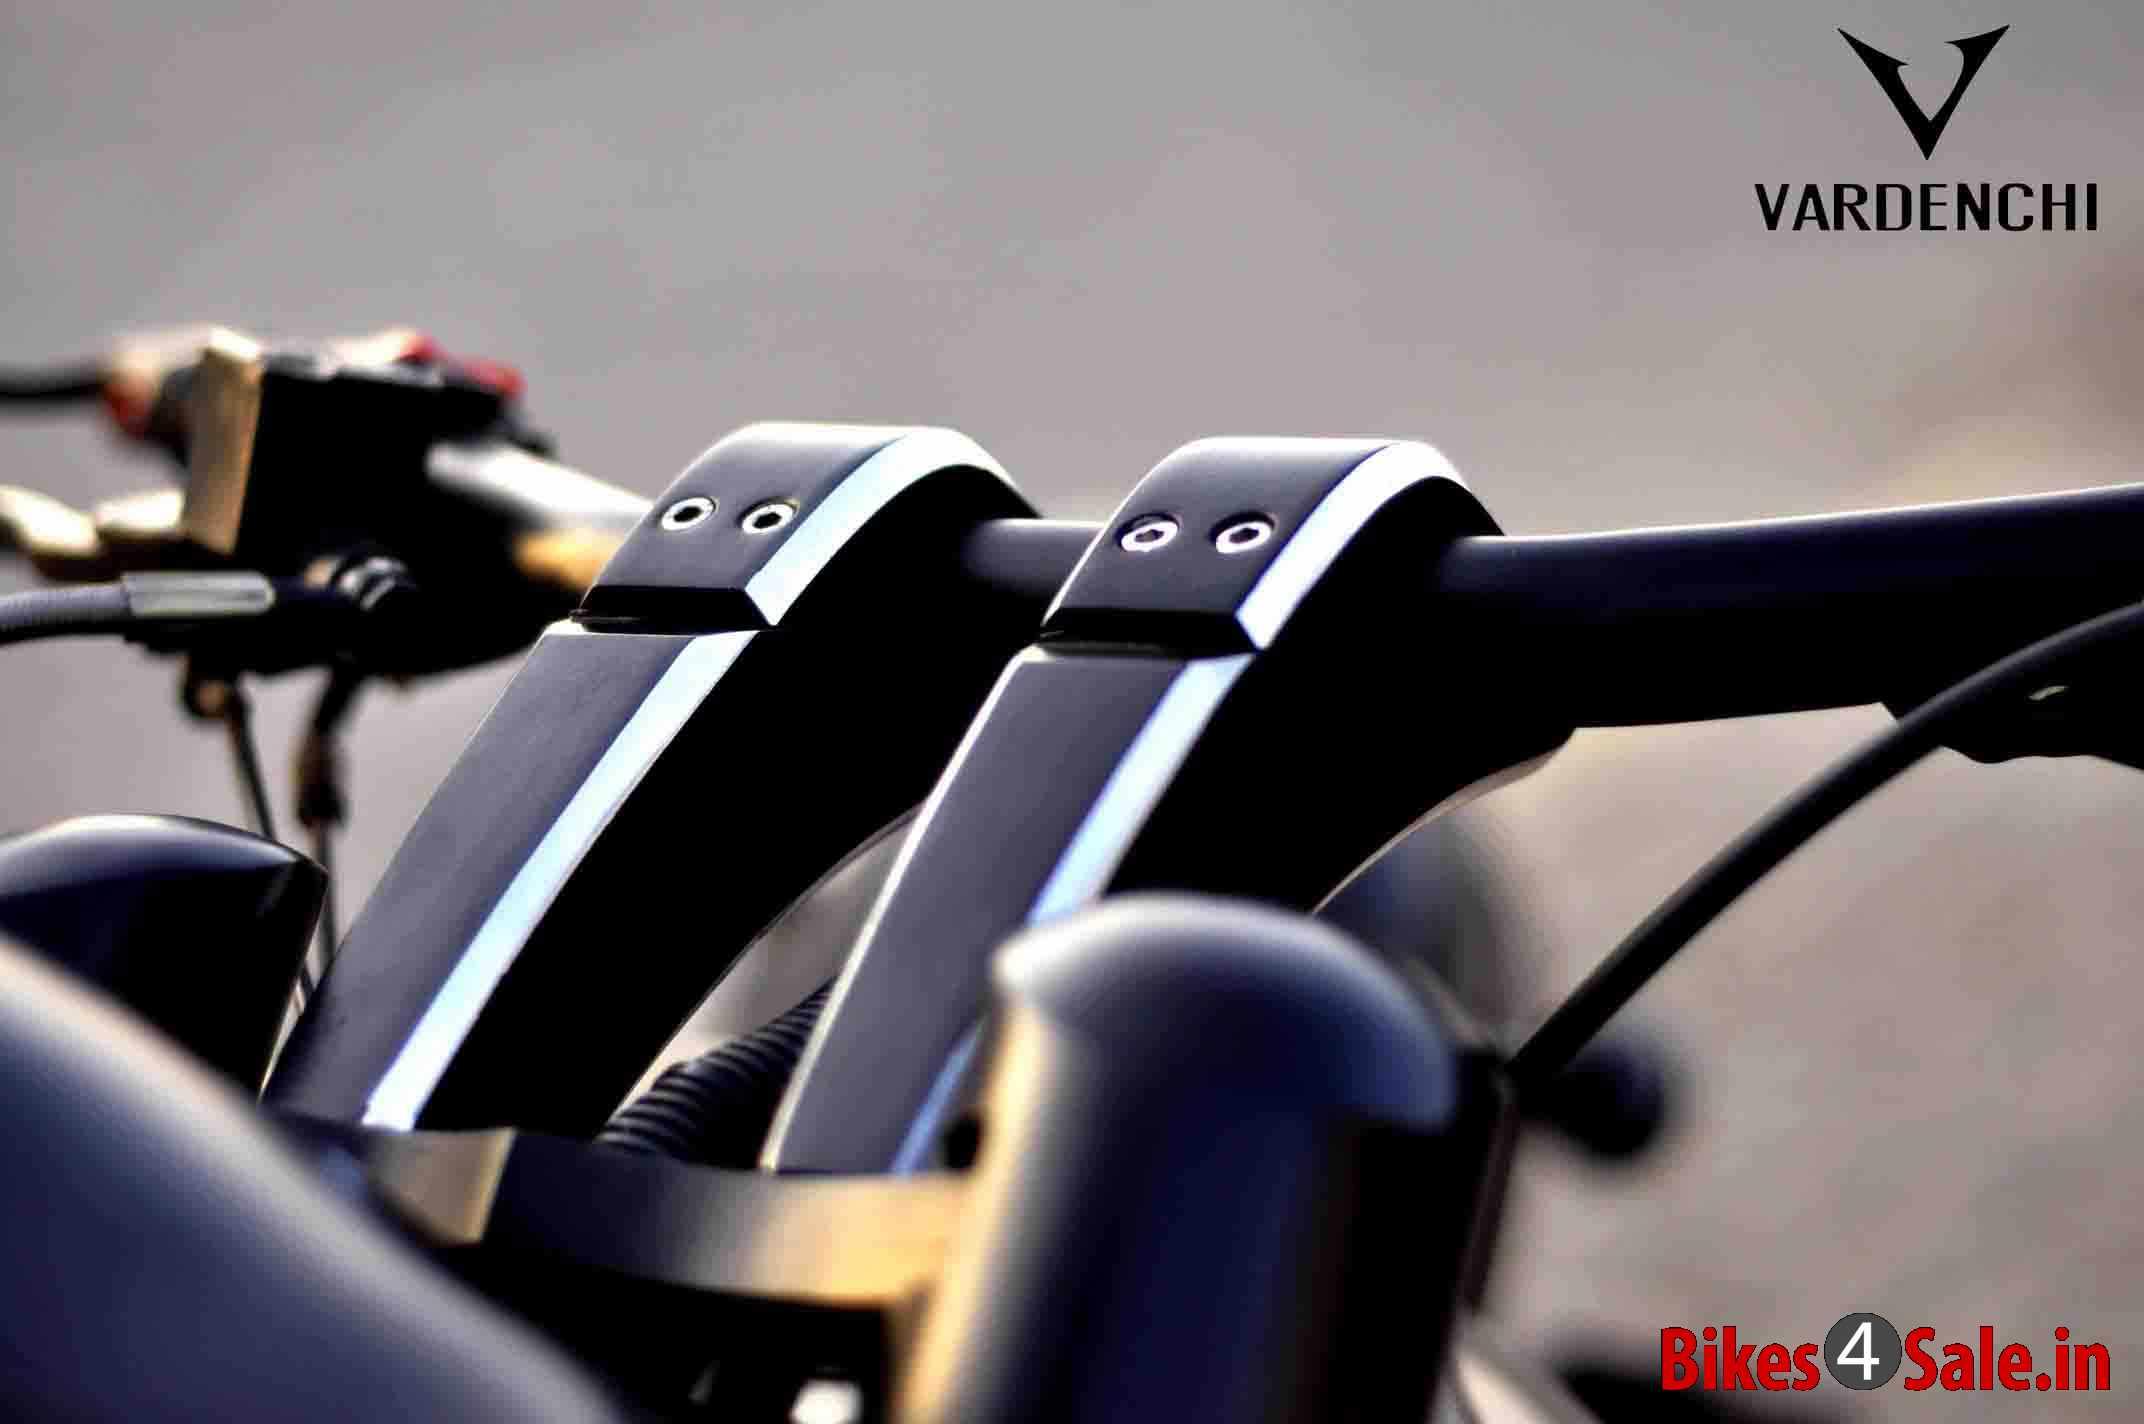 70+ Slide 3 Vardenchi Motorcycles Picture Gallery Bikes4sale - JEDI Customs Maharashtra, Slide 3 ...